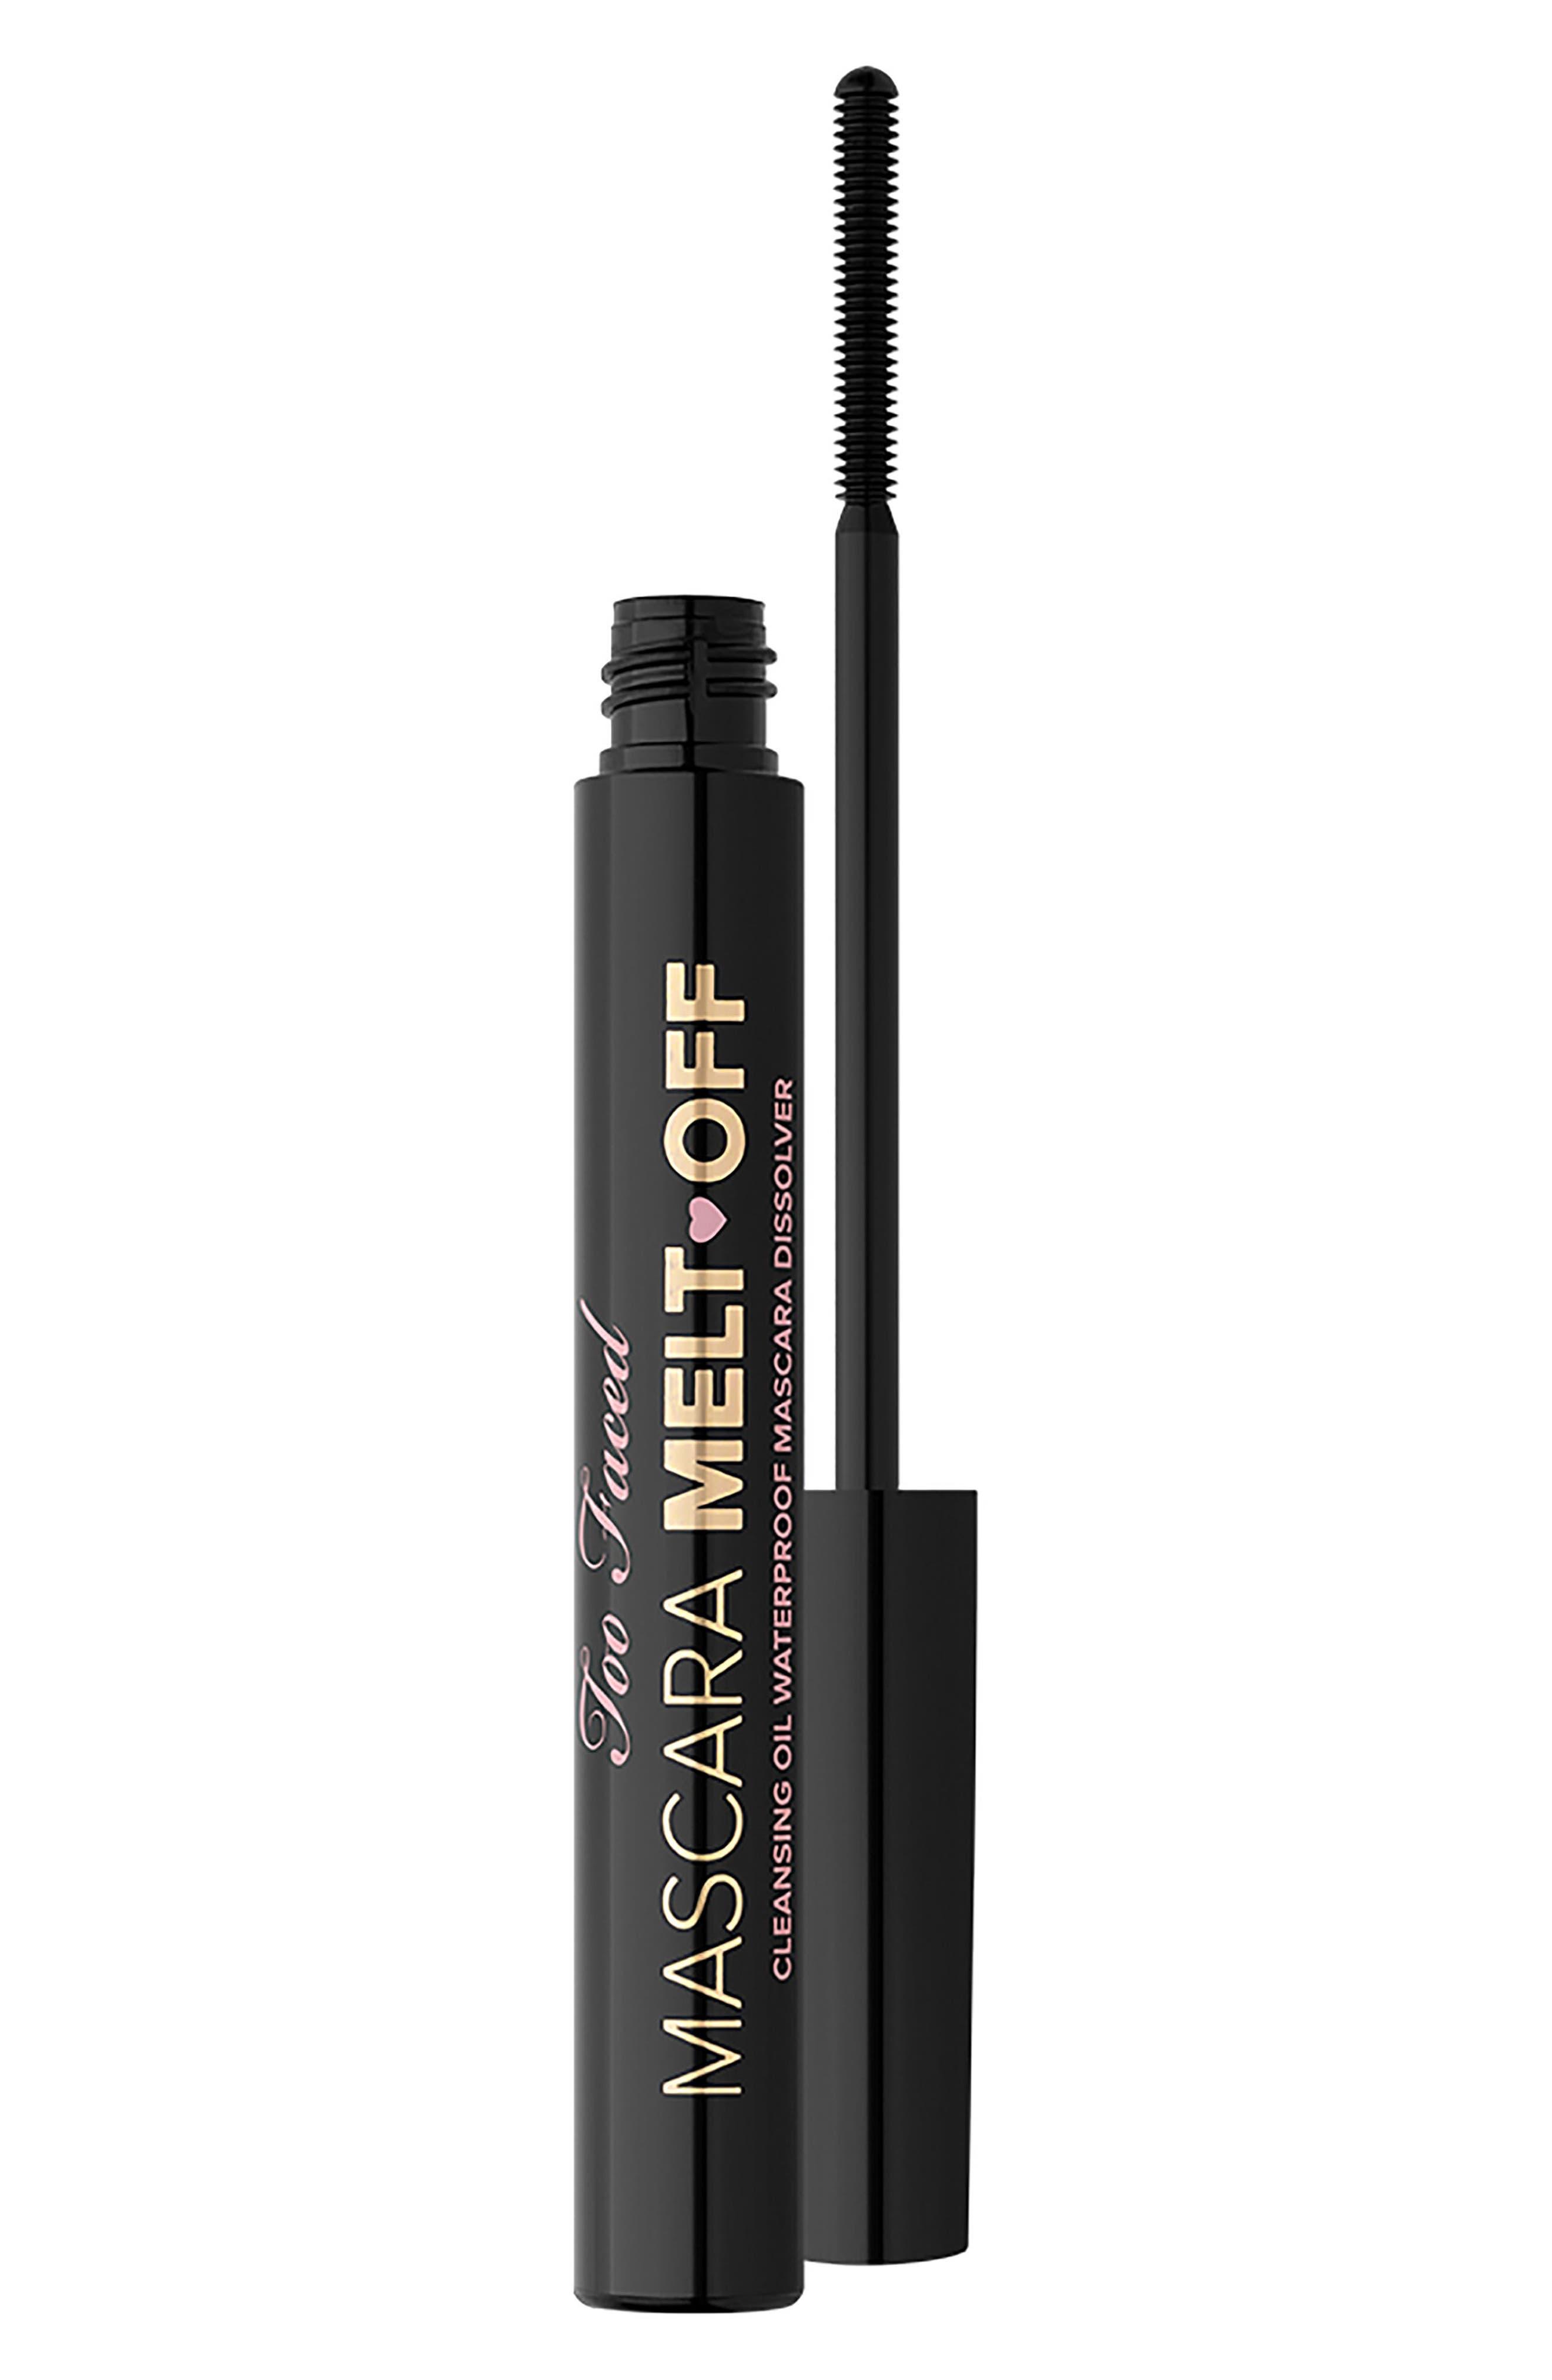 Mascara Melt Off Cleansing Oil,                         Main,                         color, No Color